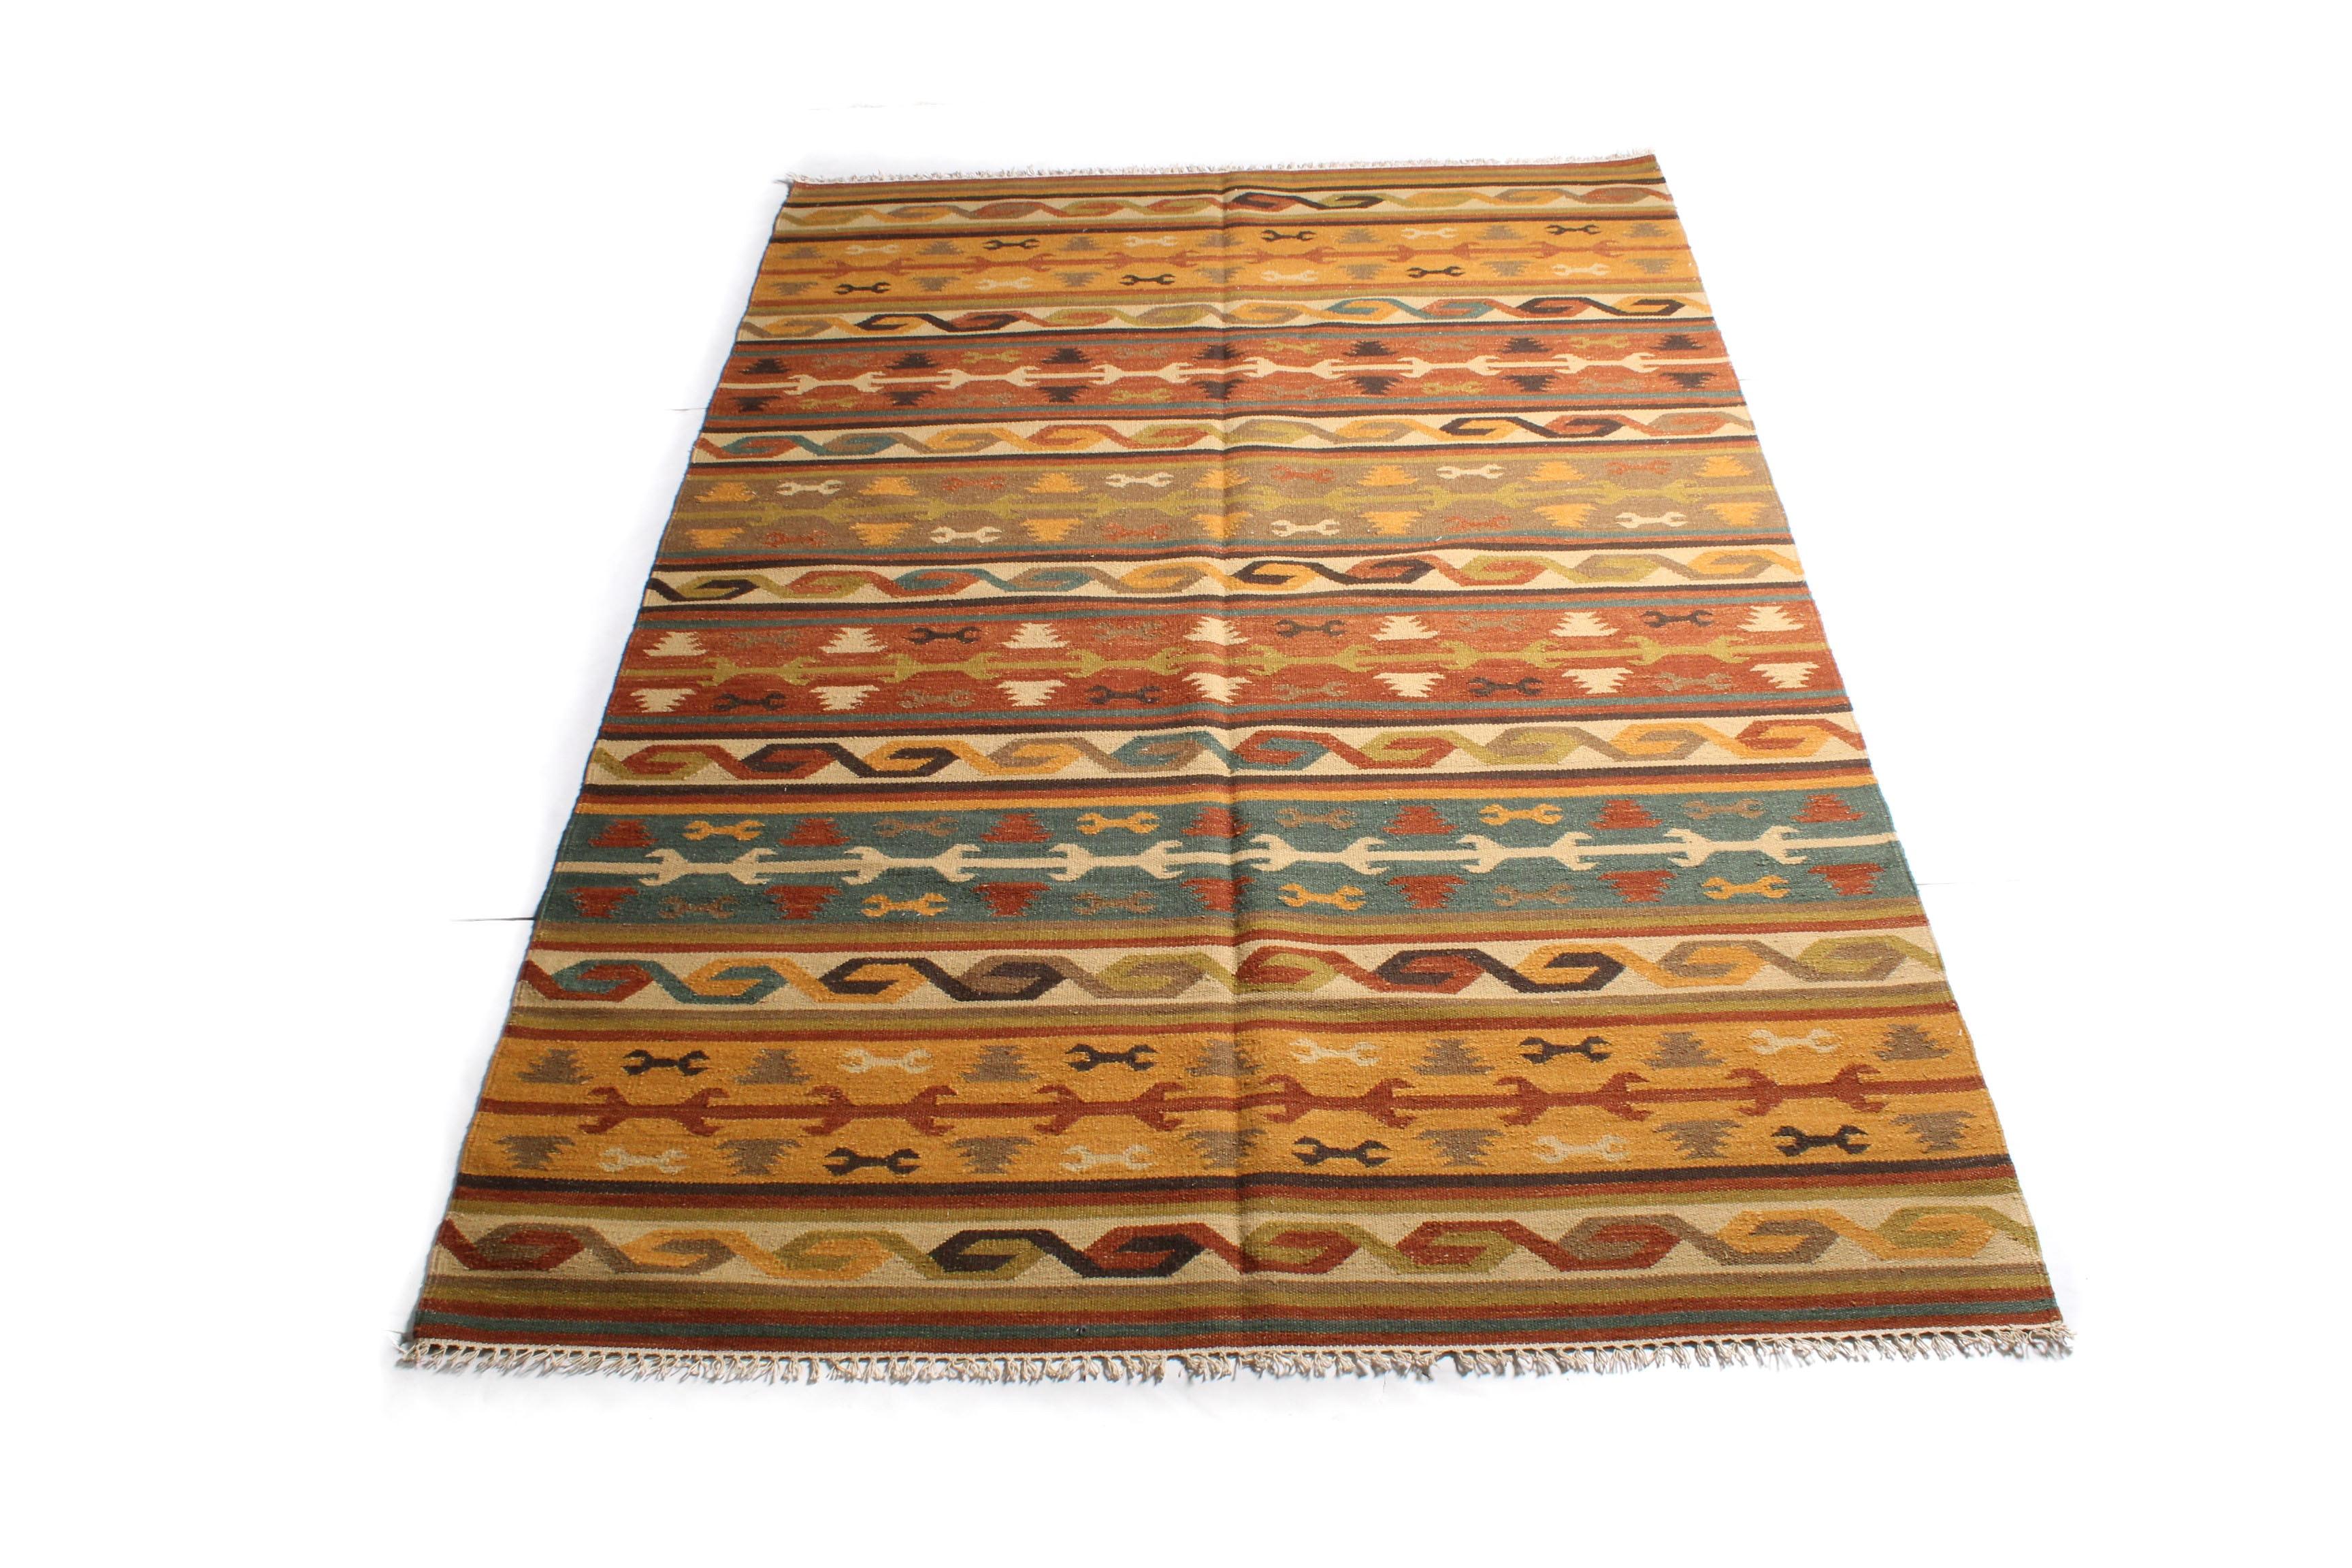 5'11 x 9'1 Handwoven Turkish Kilim Rug